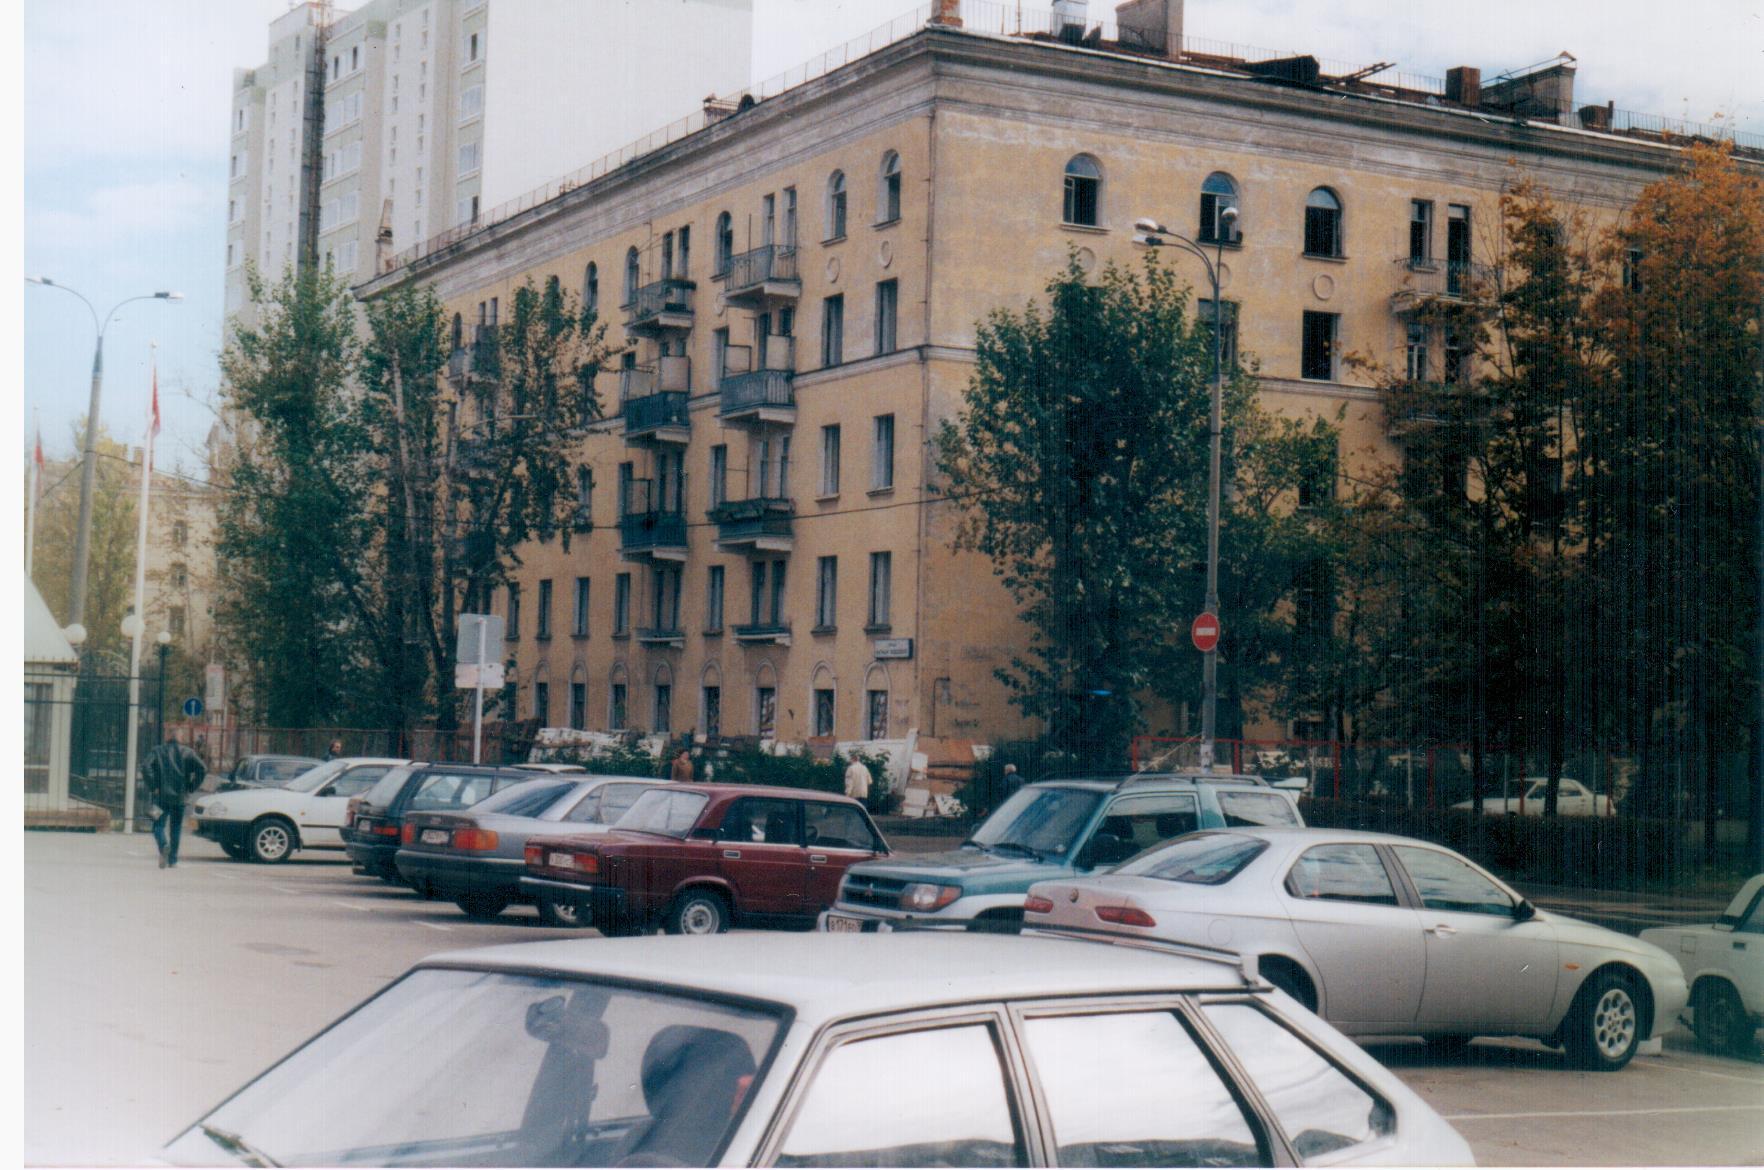 2001 перед сносом углового дома. Фото от Андрея